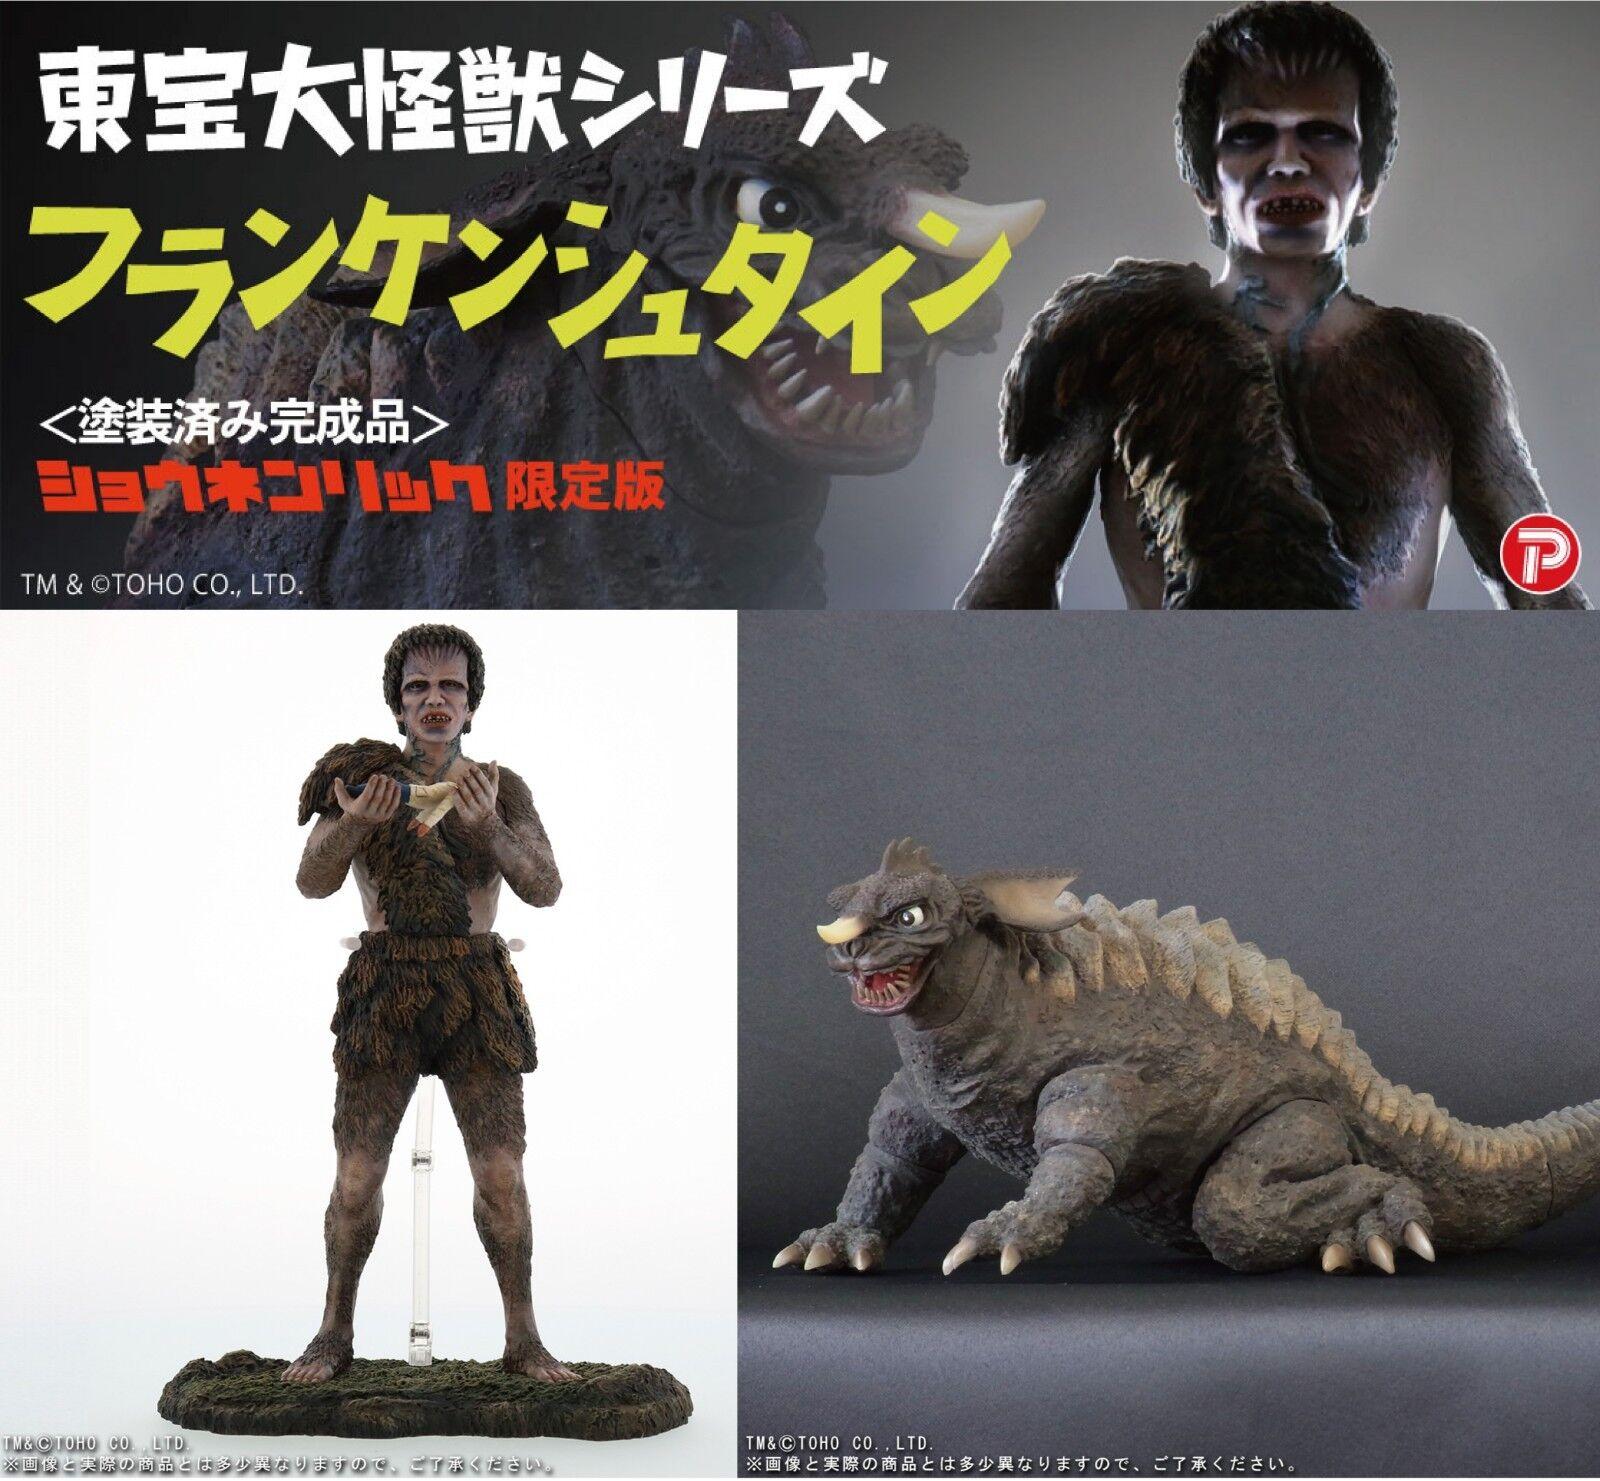 Ric-toy Limited X-PLUS Toho Daikaiju Series Frankenstein & Baragon set PLEX